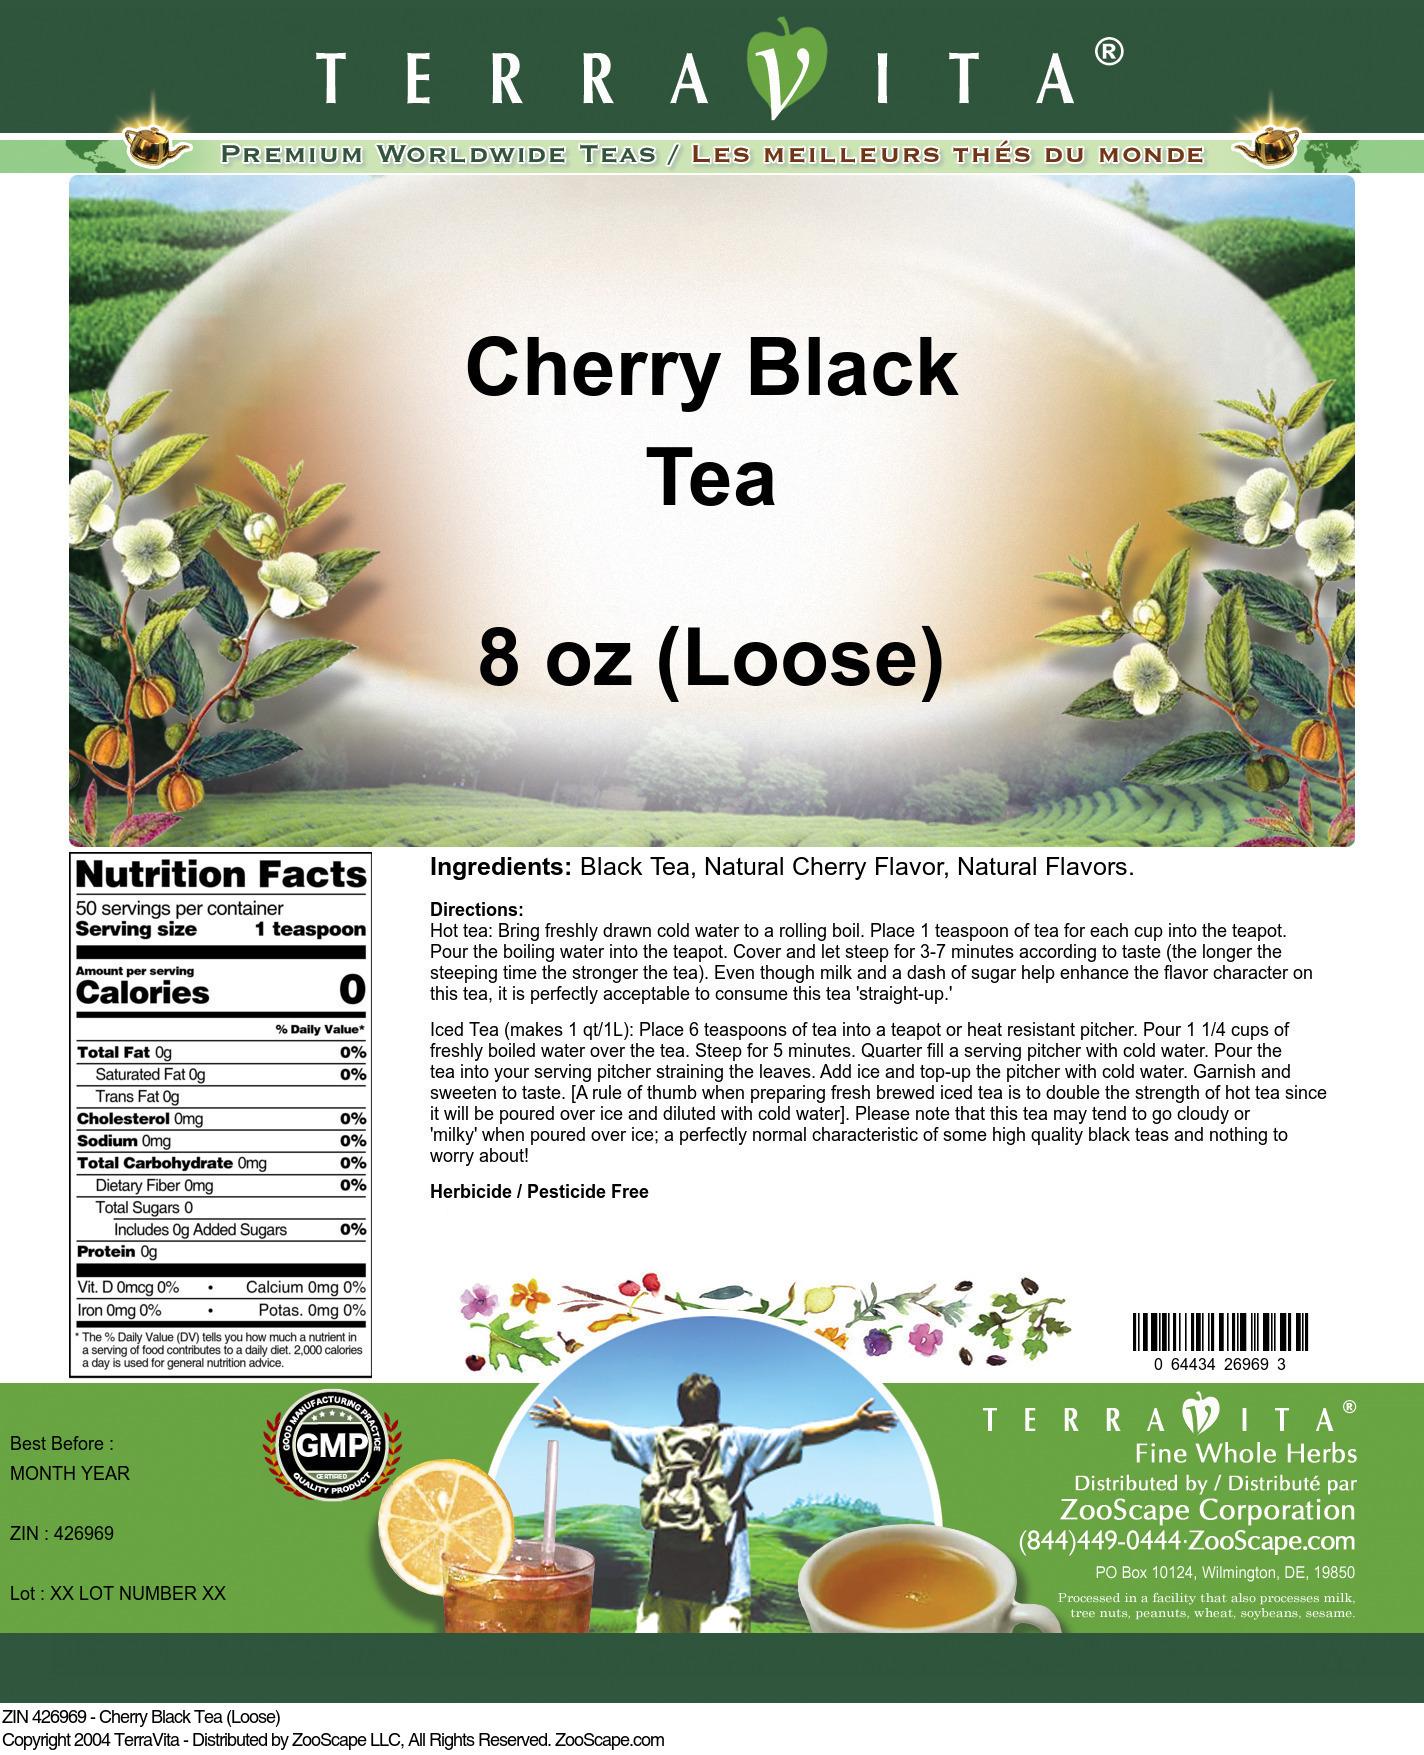 Cherry Black Tea (Loose) - Label